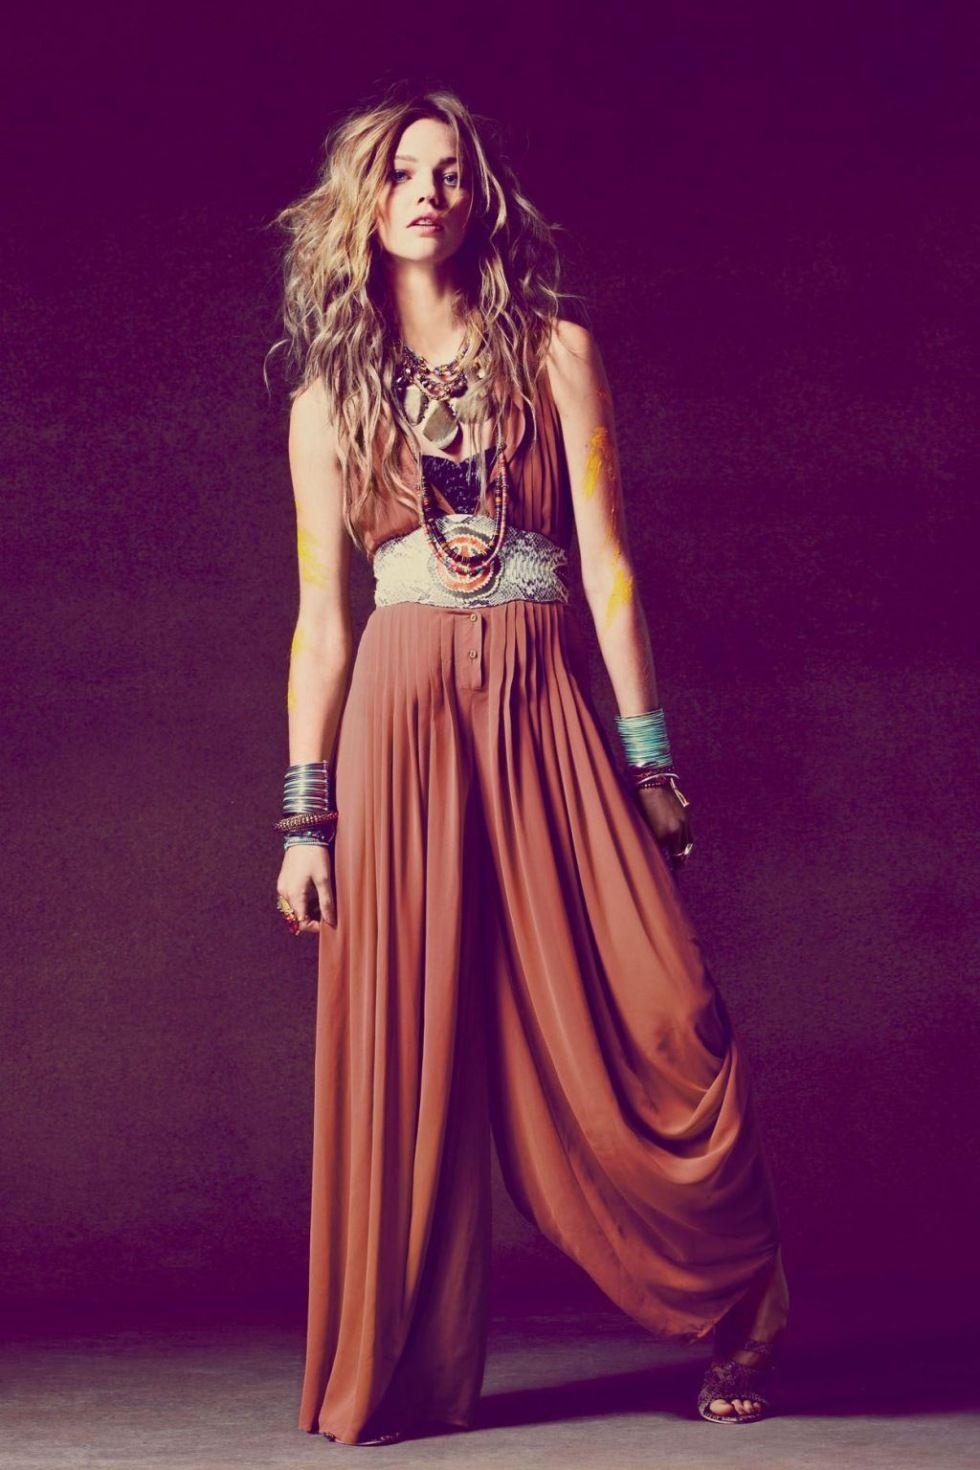 Dress Like A Hippie Womenfashionblog Womenfashions Realwomenfashion